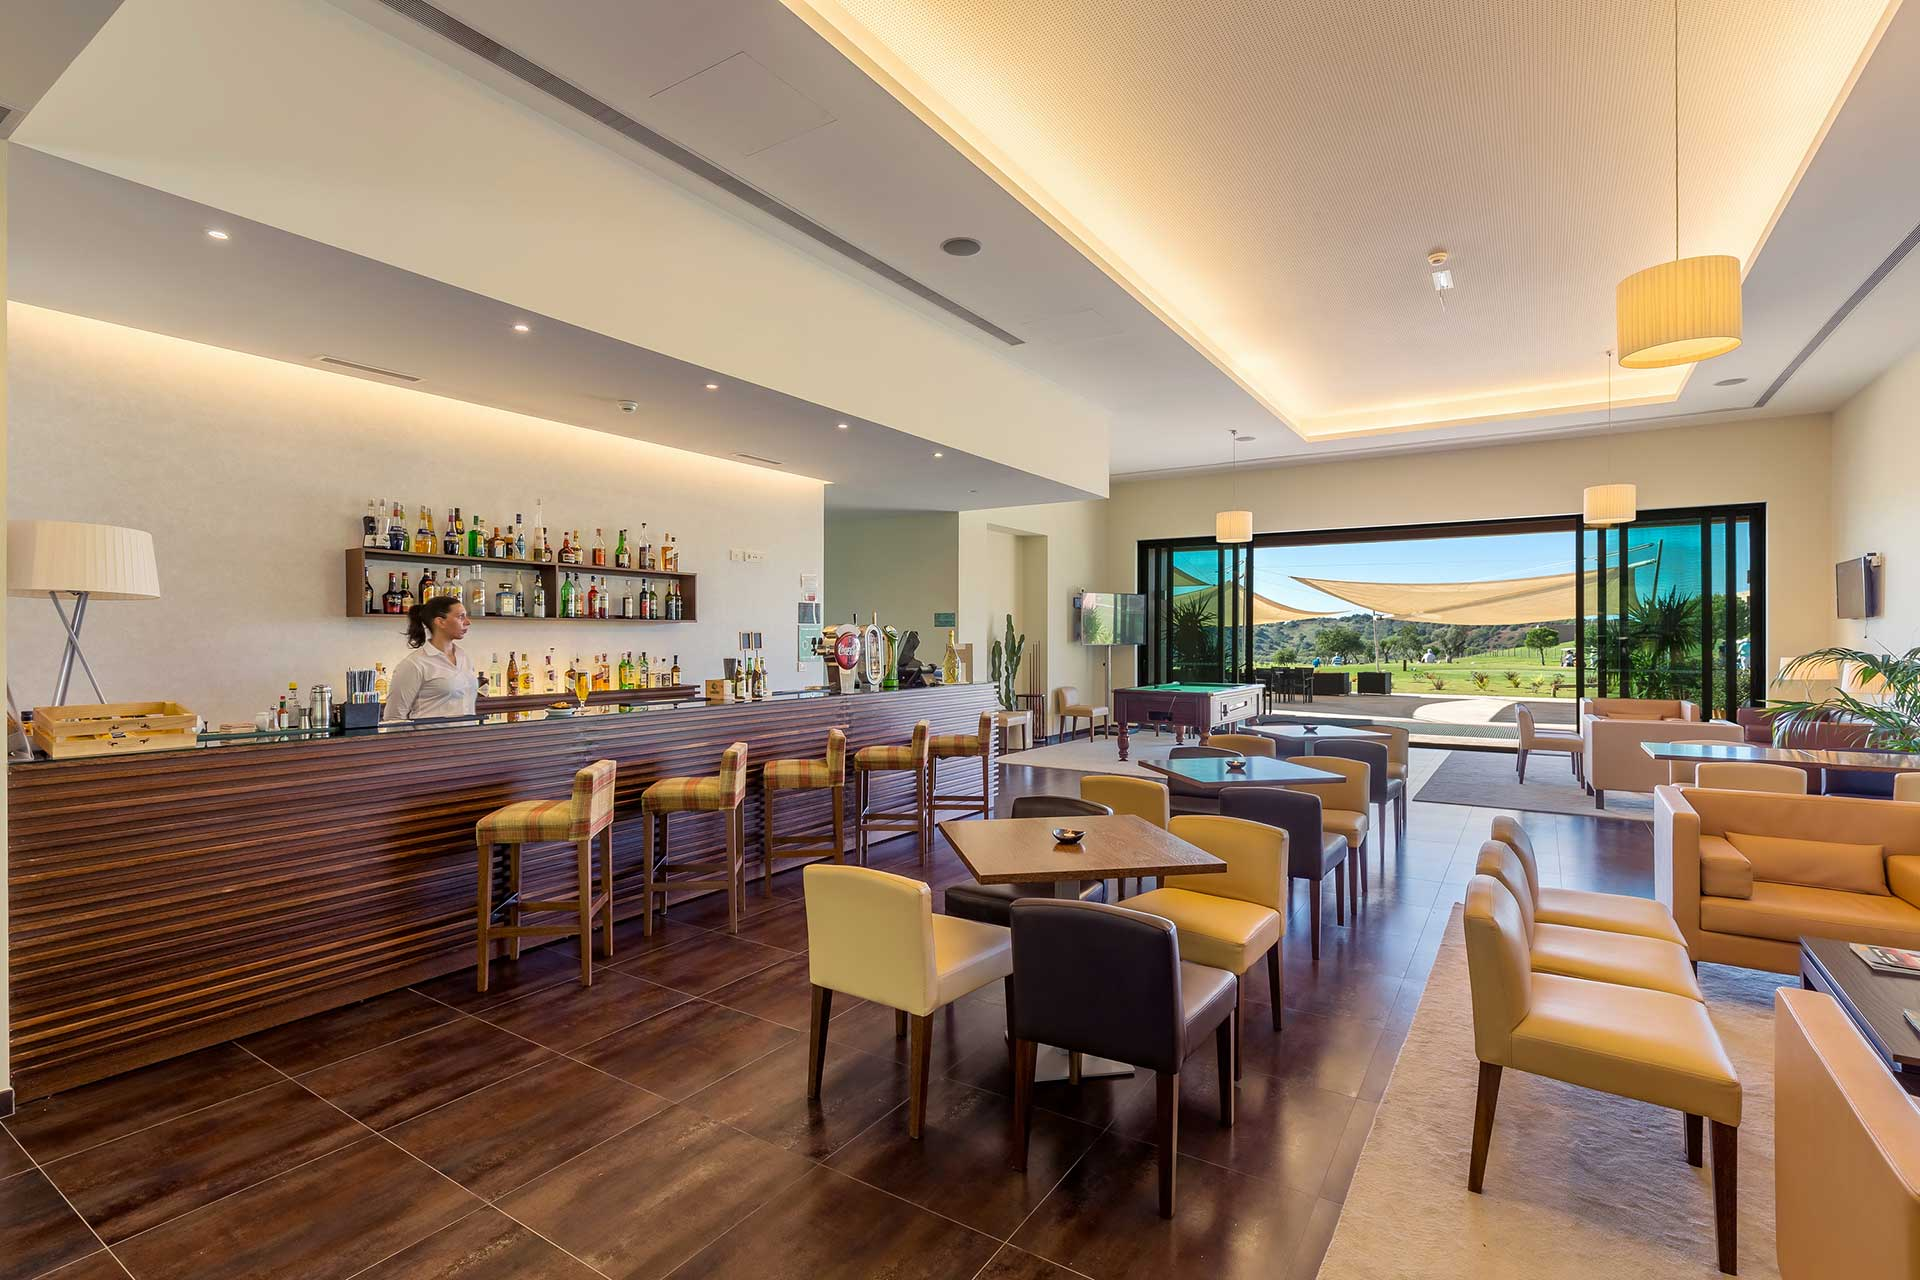 Golf-expedition-golfreizen-golfresort-Morgado-Golf-&-Country-Club-Restaurant